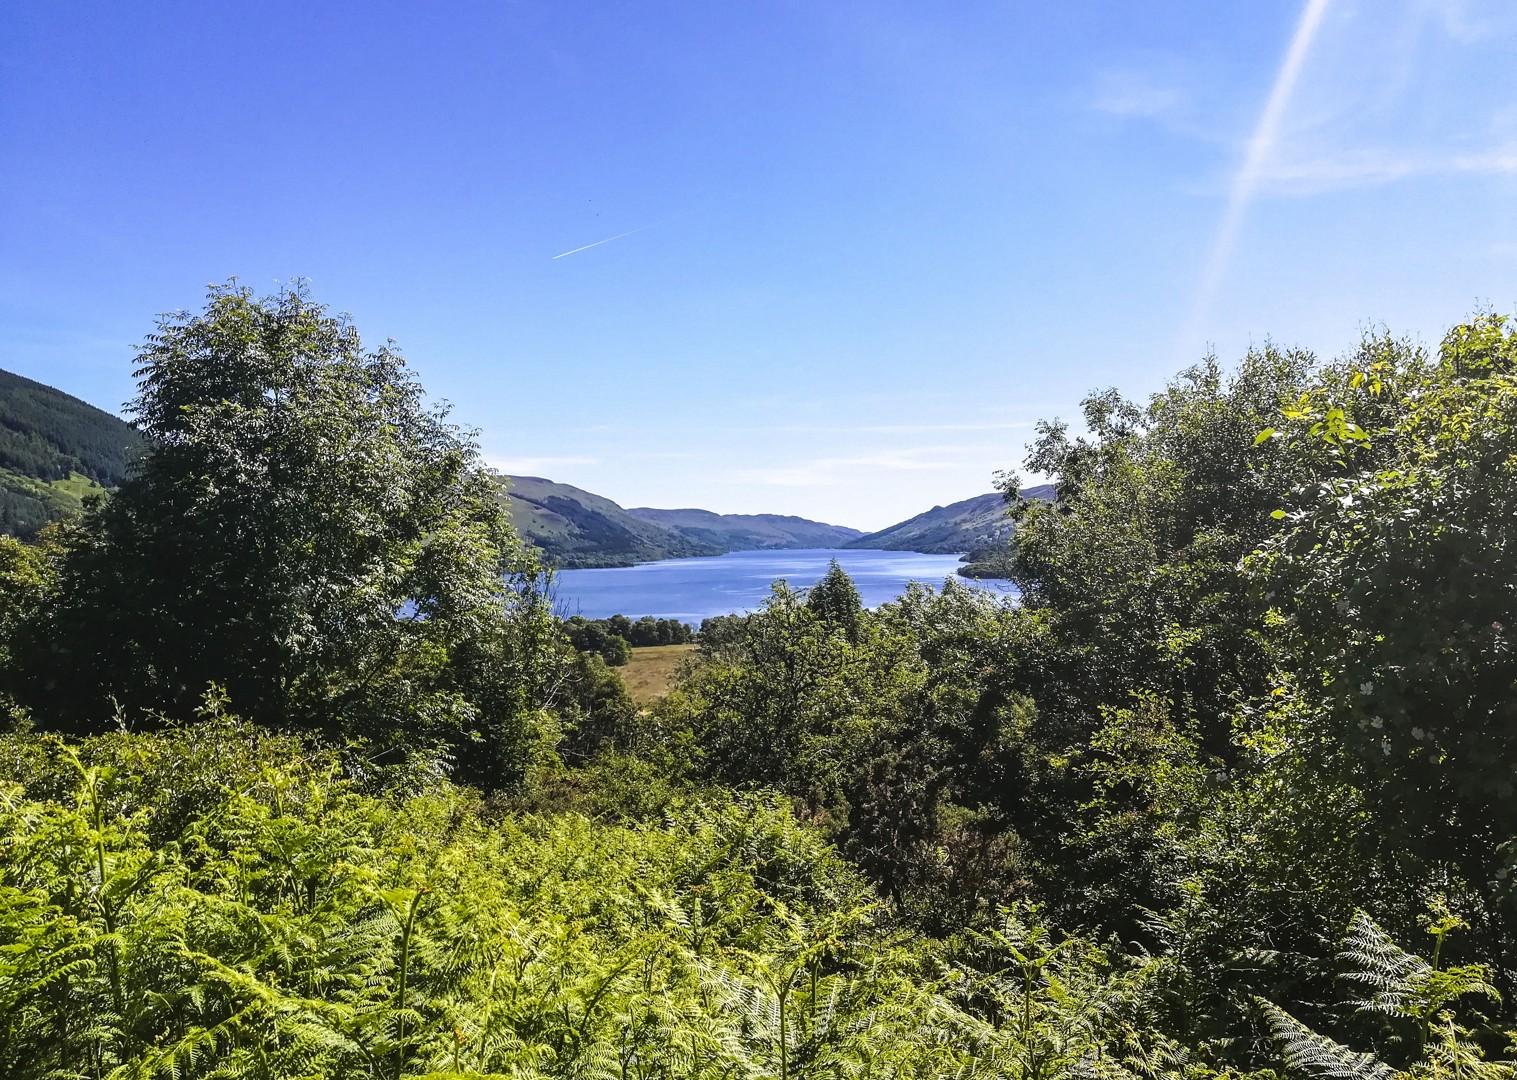 trossachs-scotland-uk-mountains-glens-lochs-family-fun-cycling-holiday.jpg - UK - Scotland - Lochs and Glens - Self-Guided Family Cycling Holiday - Family Cycling